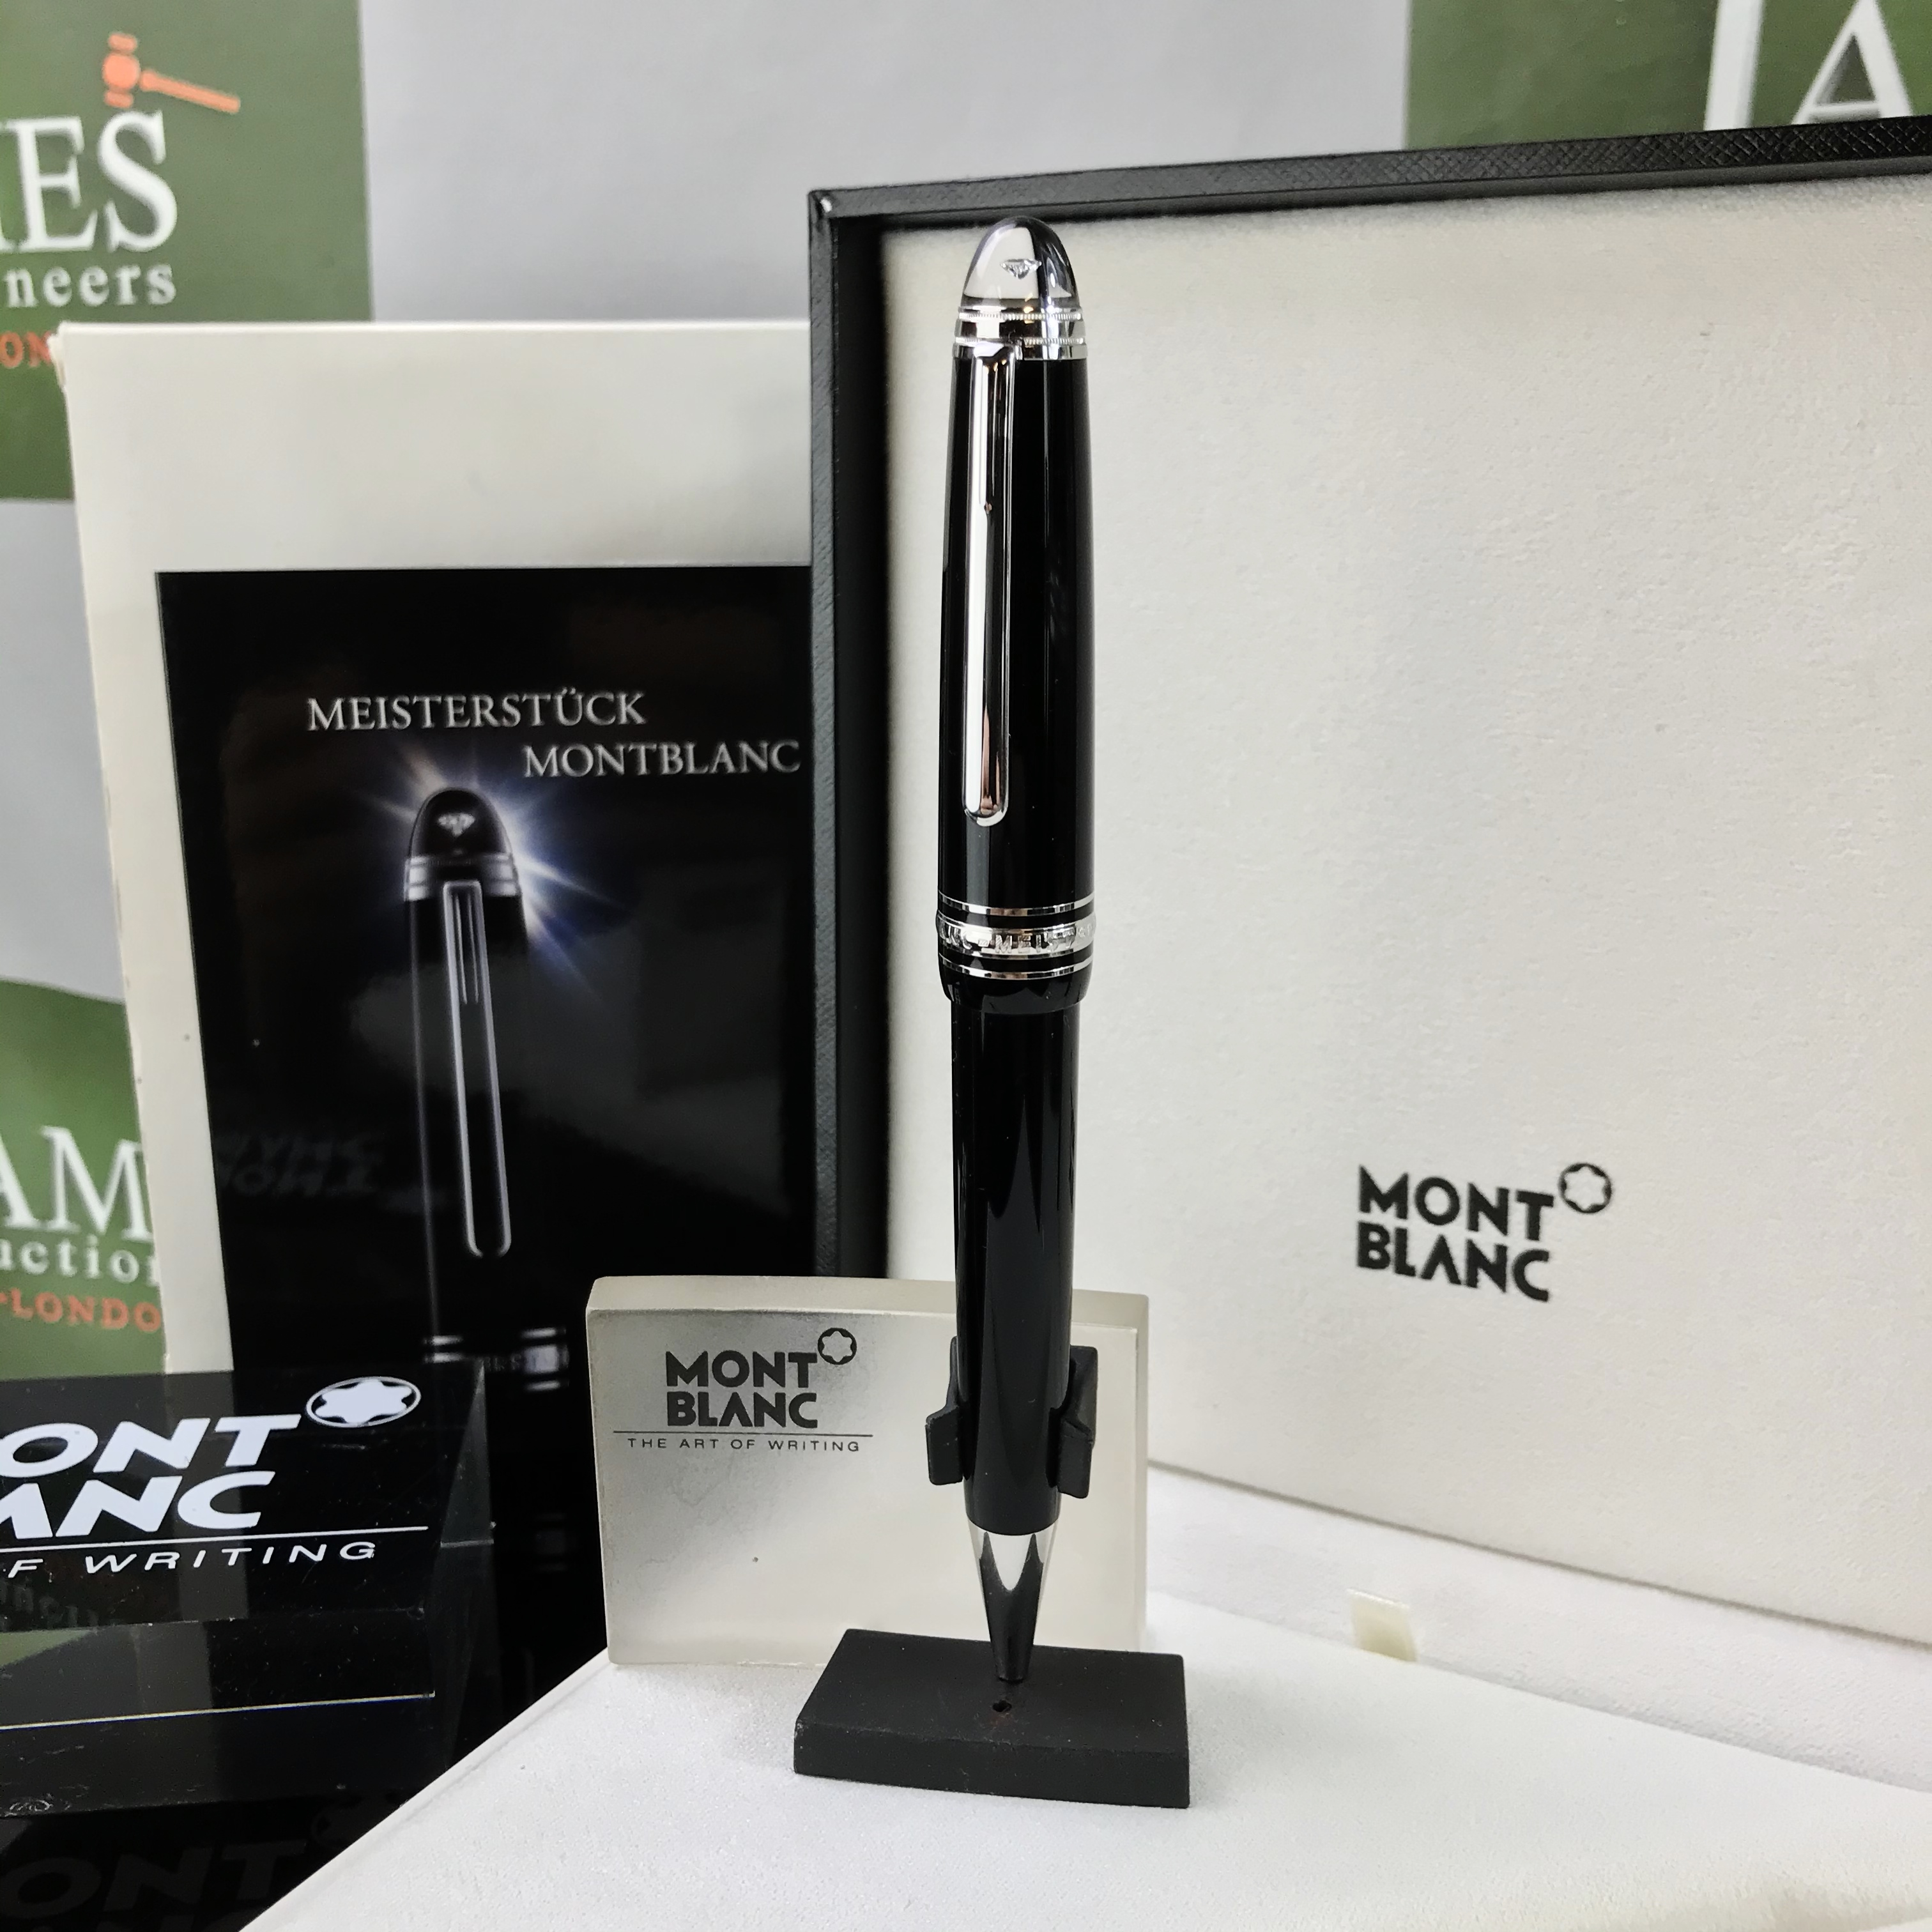 Lot 20 - Montblanc Meisterstuck Diamond Pen Ltd Edition / Certificate Included